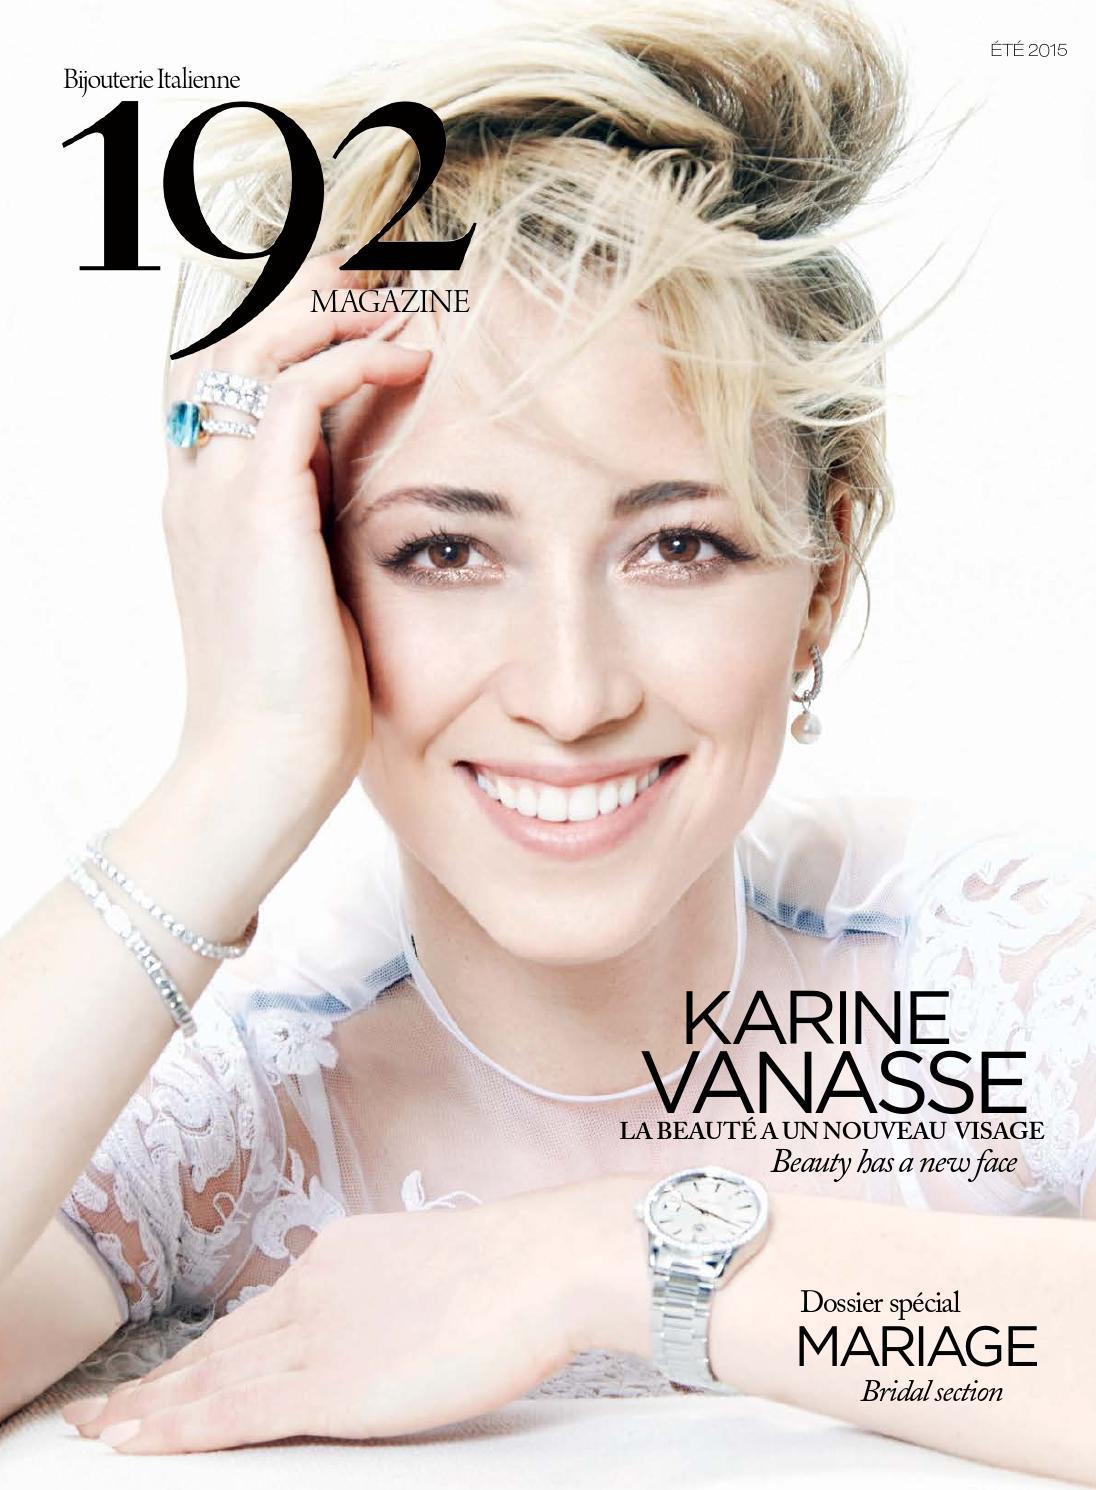 8298aad0446b16 192 Magazine by 192magazine - issuu